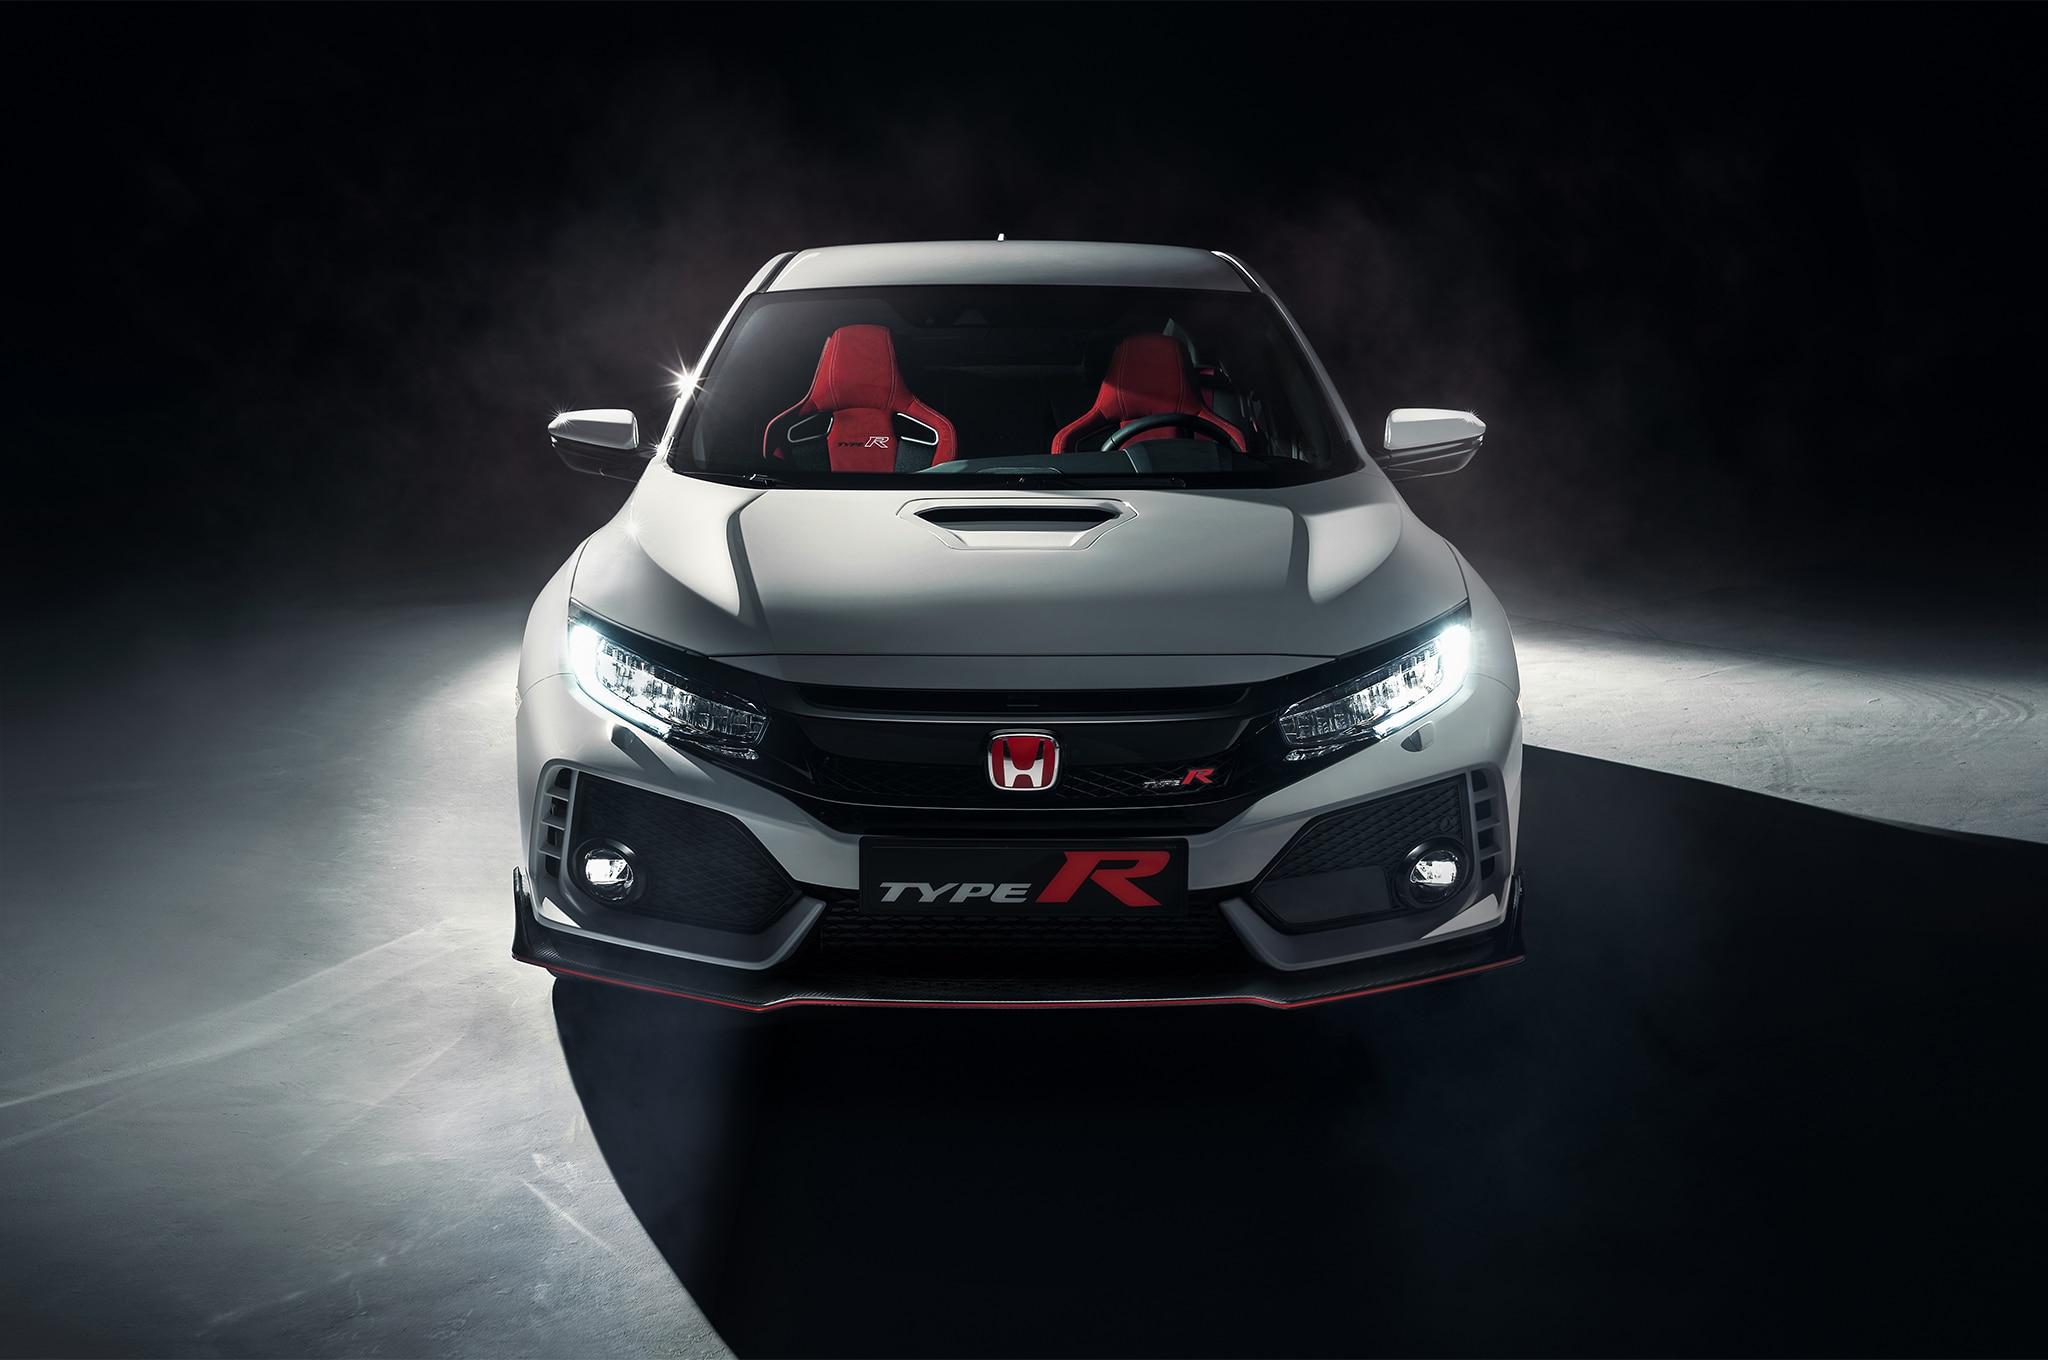 Honda Of America Mfg Honda Civic Type R 2017: Primer Vistazo - Motor Trend en Español